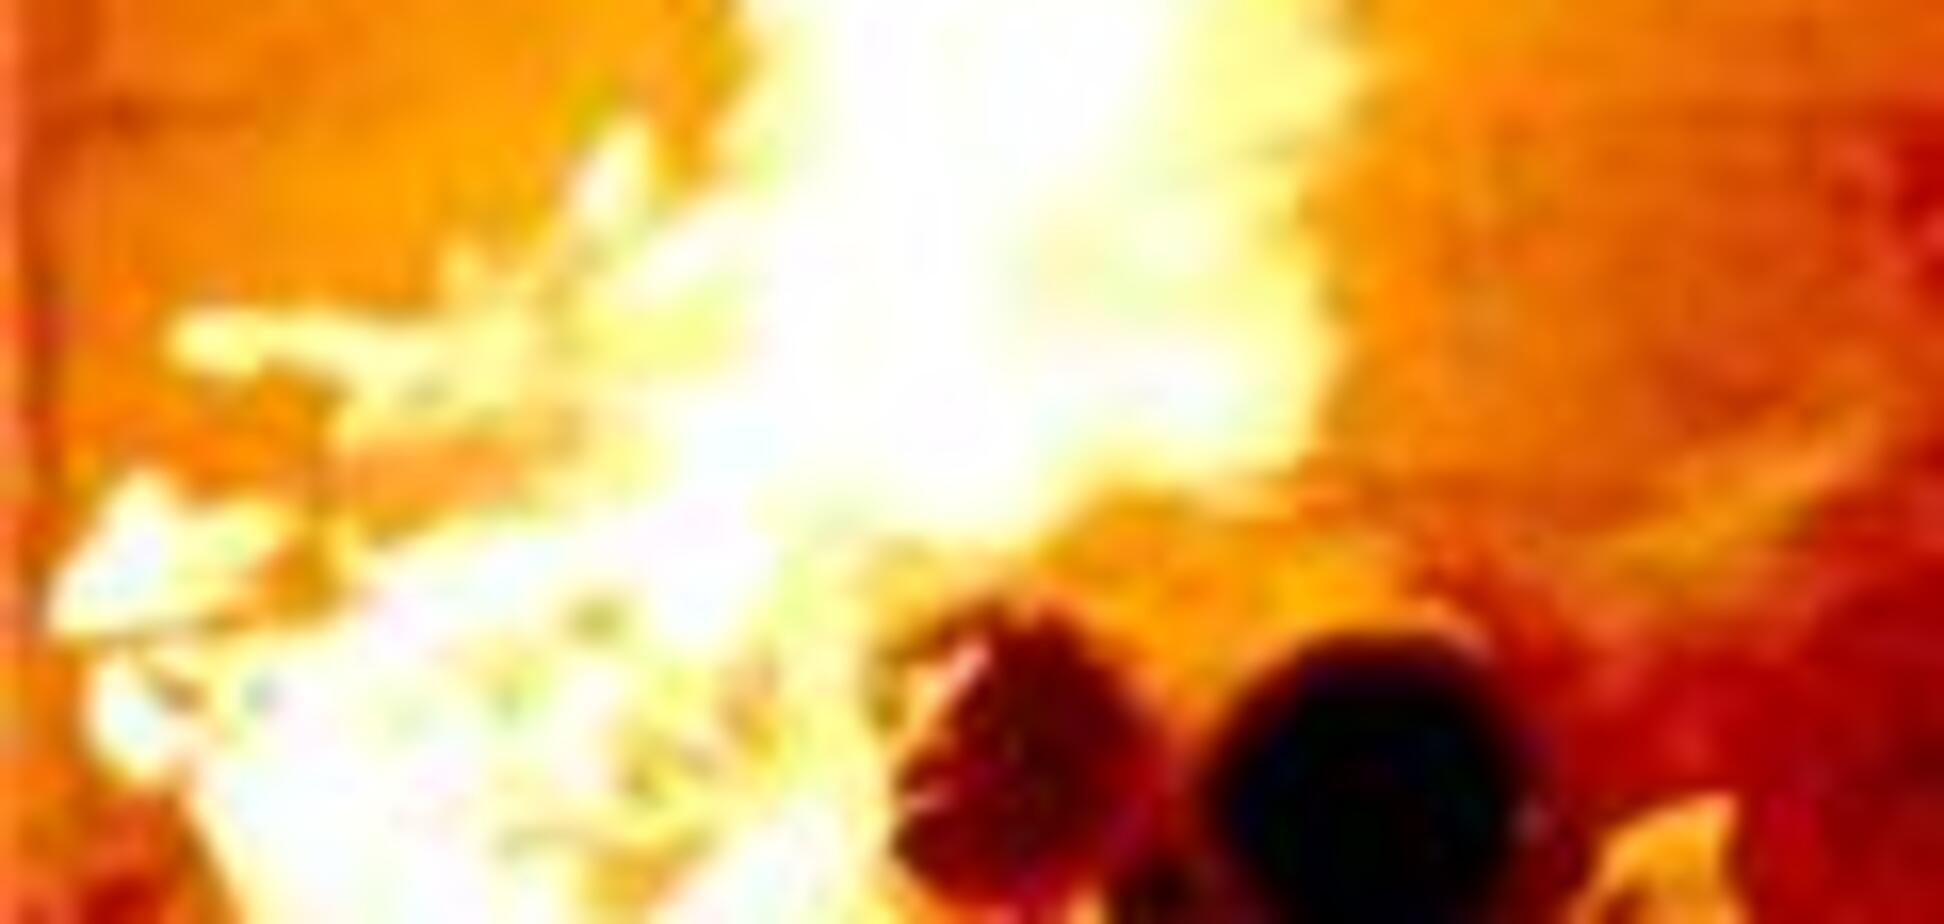 Пожежа в розважальному комплексі